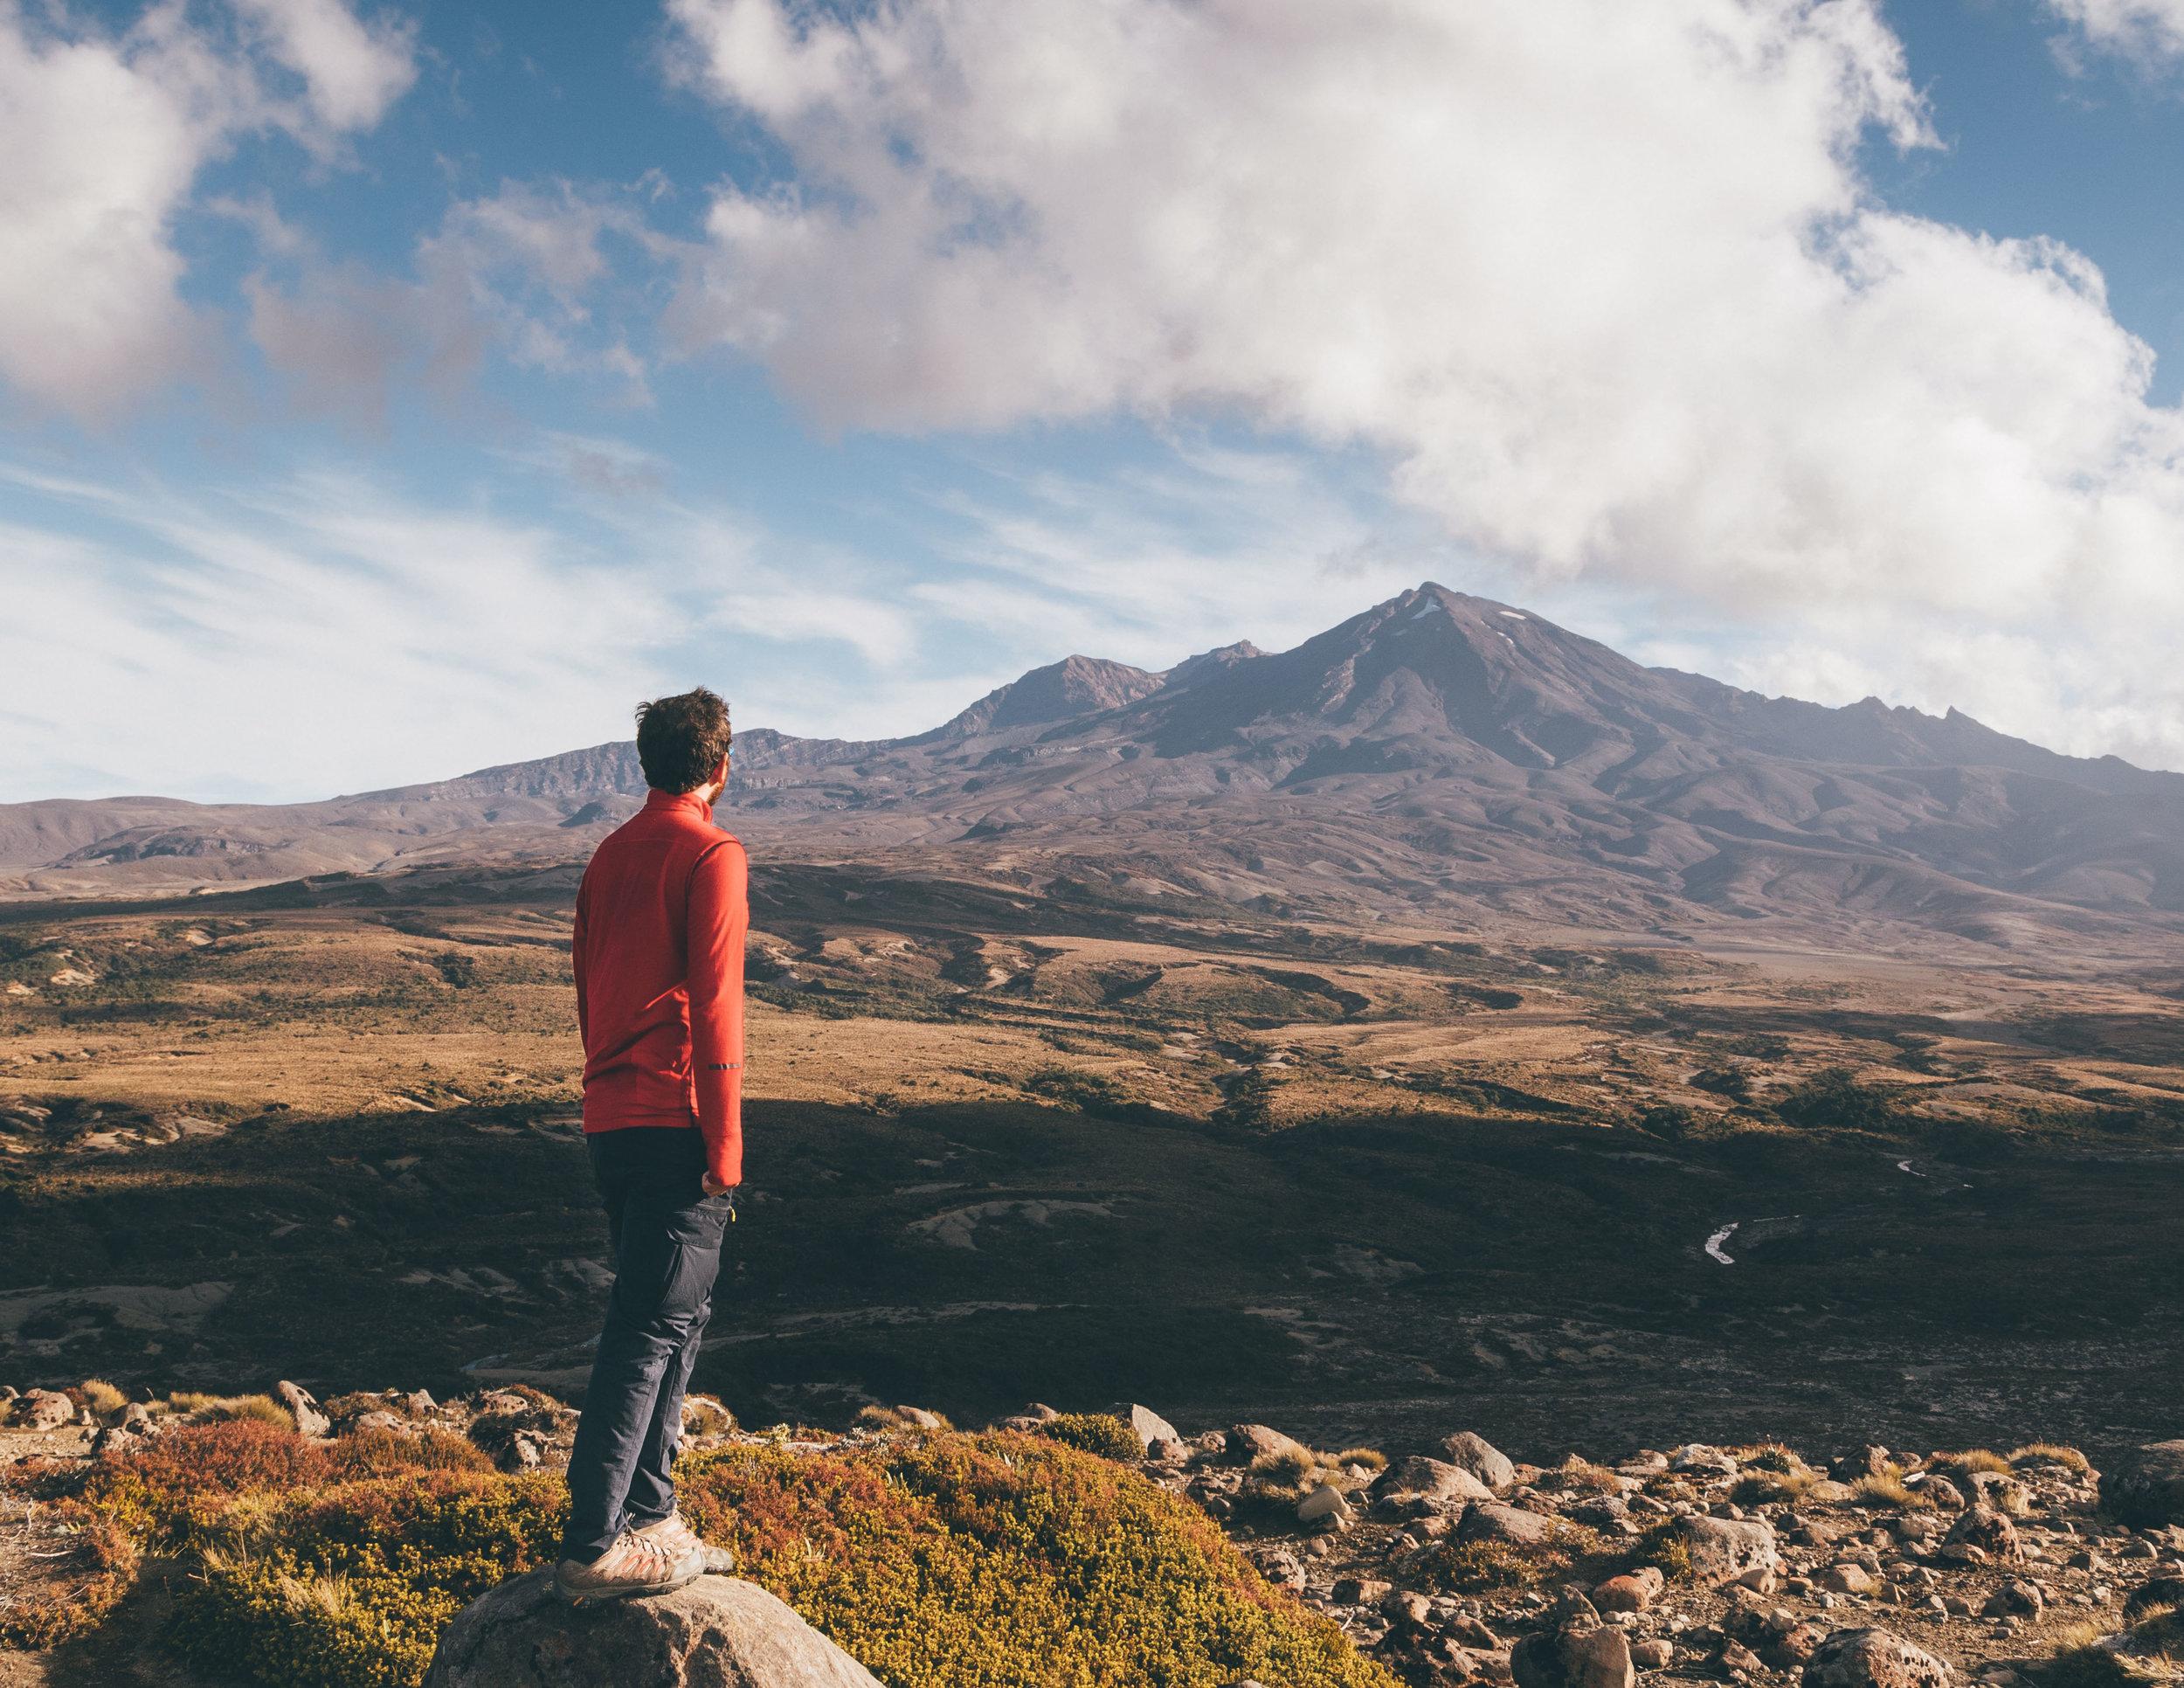 Mount Ruapheu